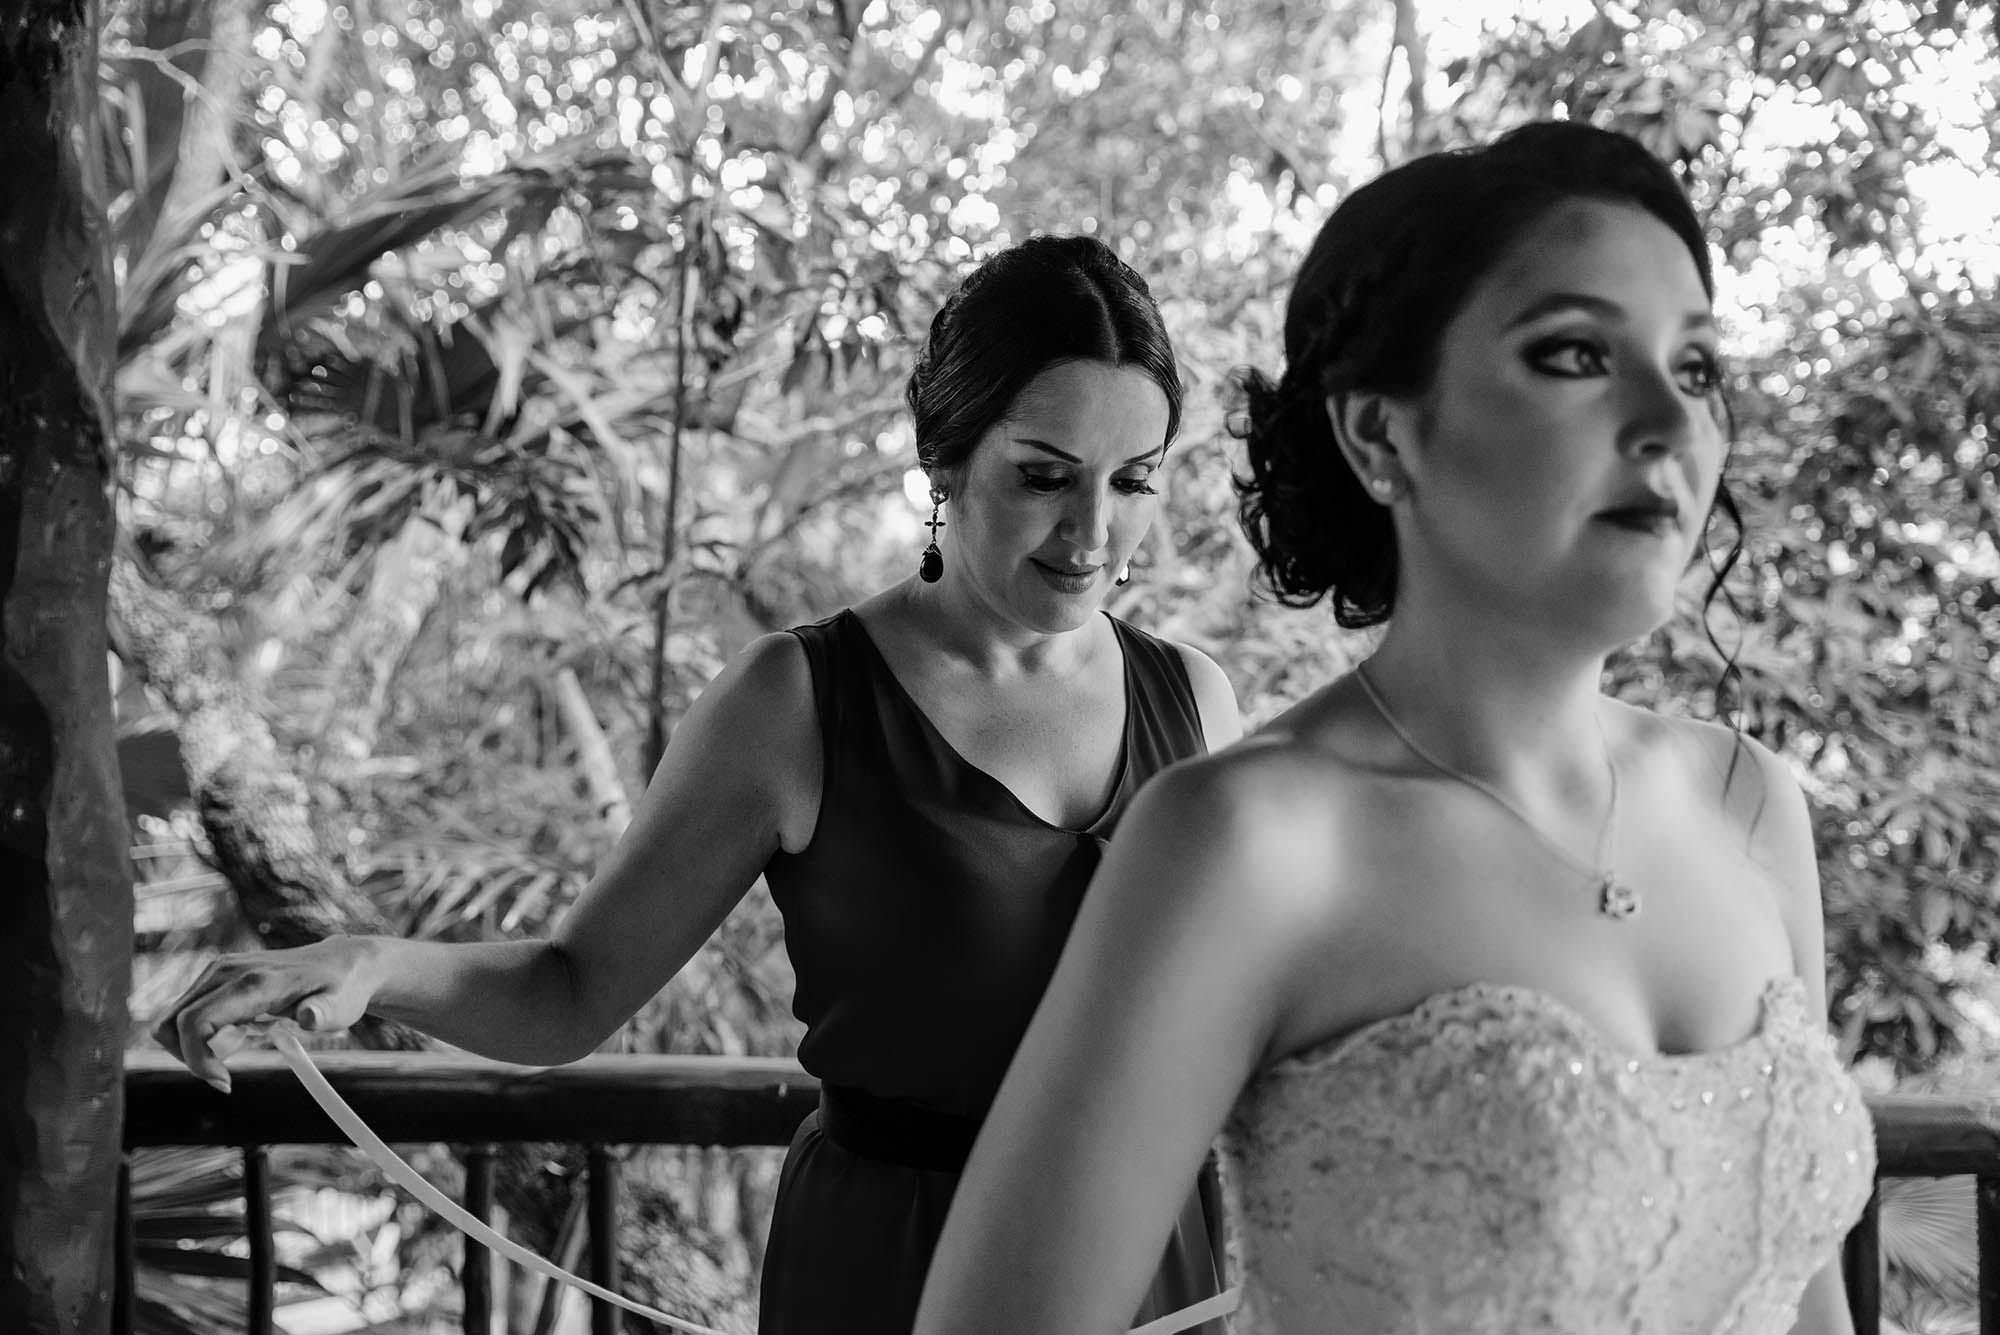 Wedding playa del carmen planner destination mexico magali espinosa05-WEB.jpg